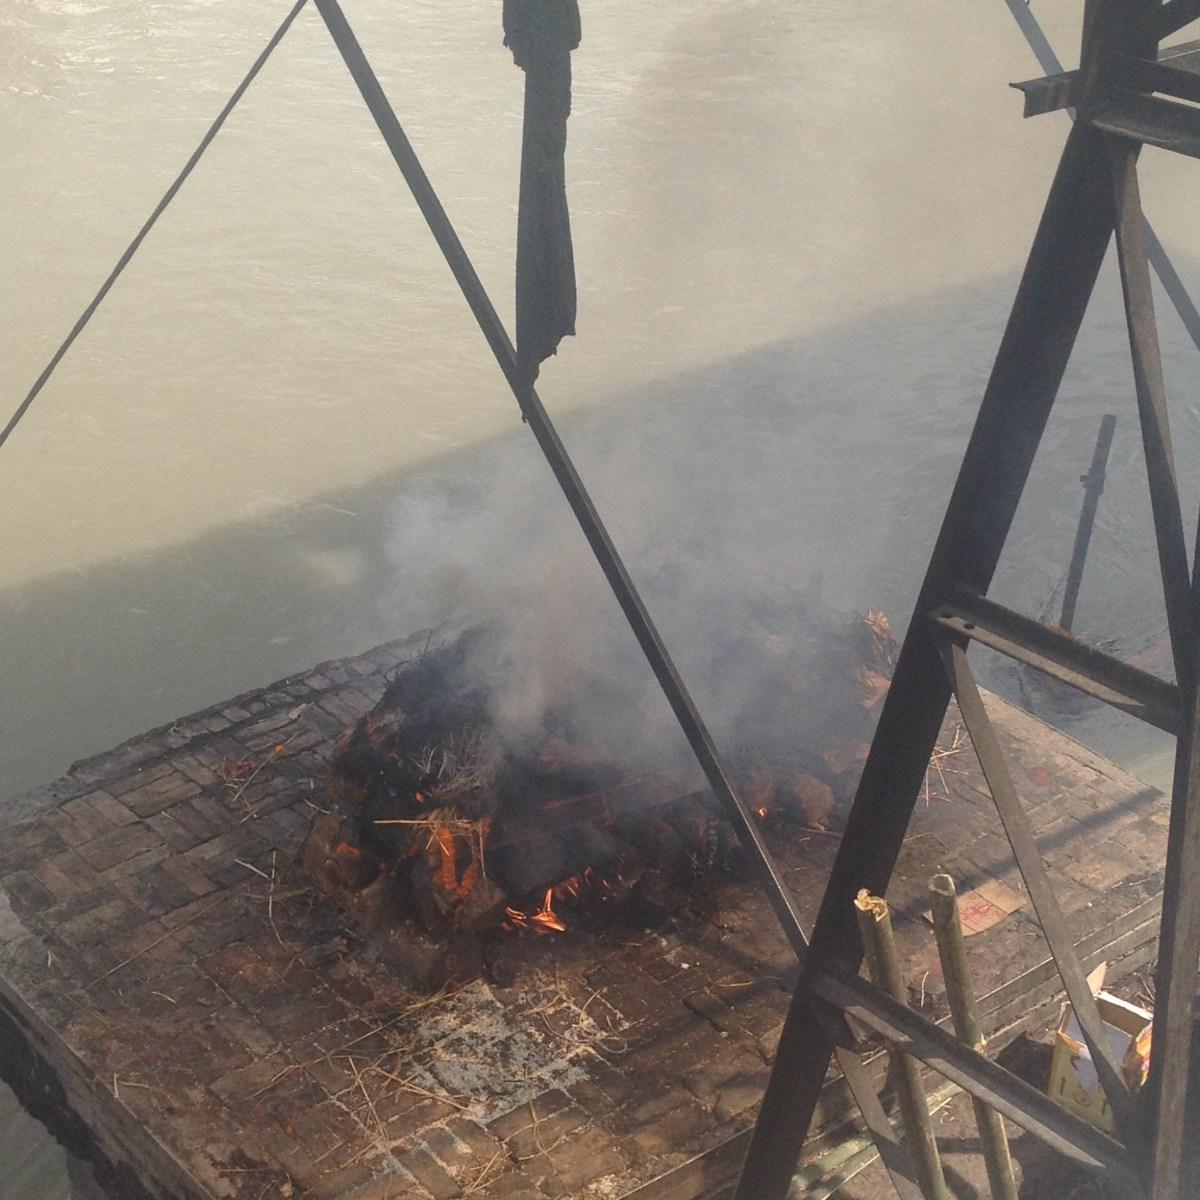 Kathmandu Tourism: Pashupatinath Burning Ghats